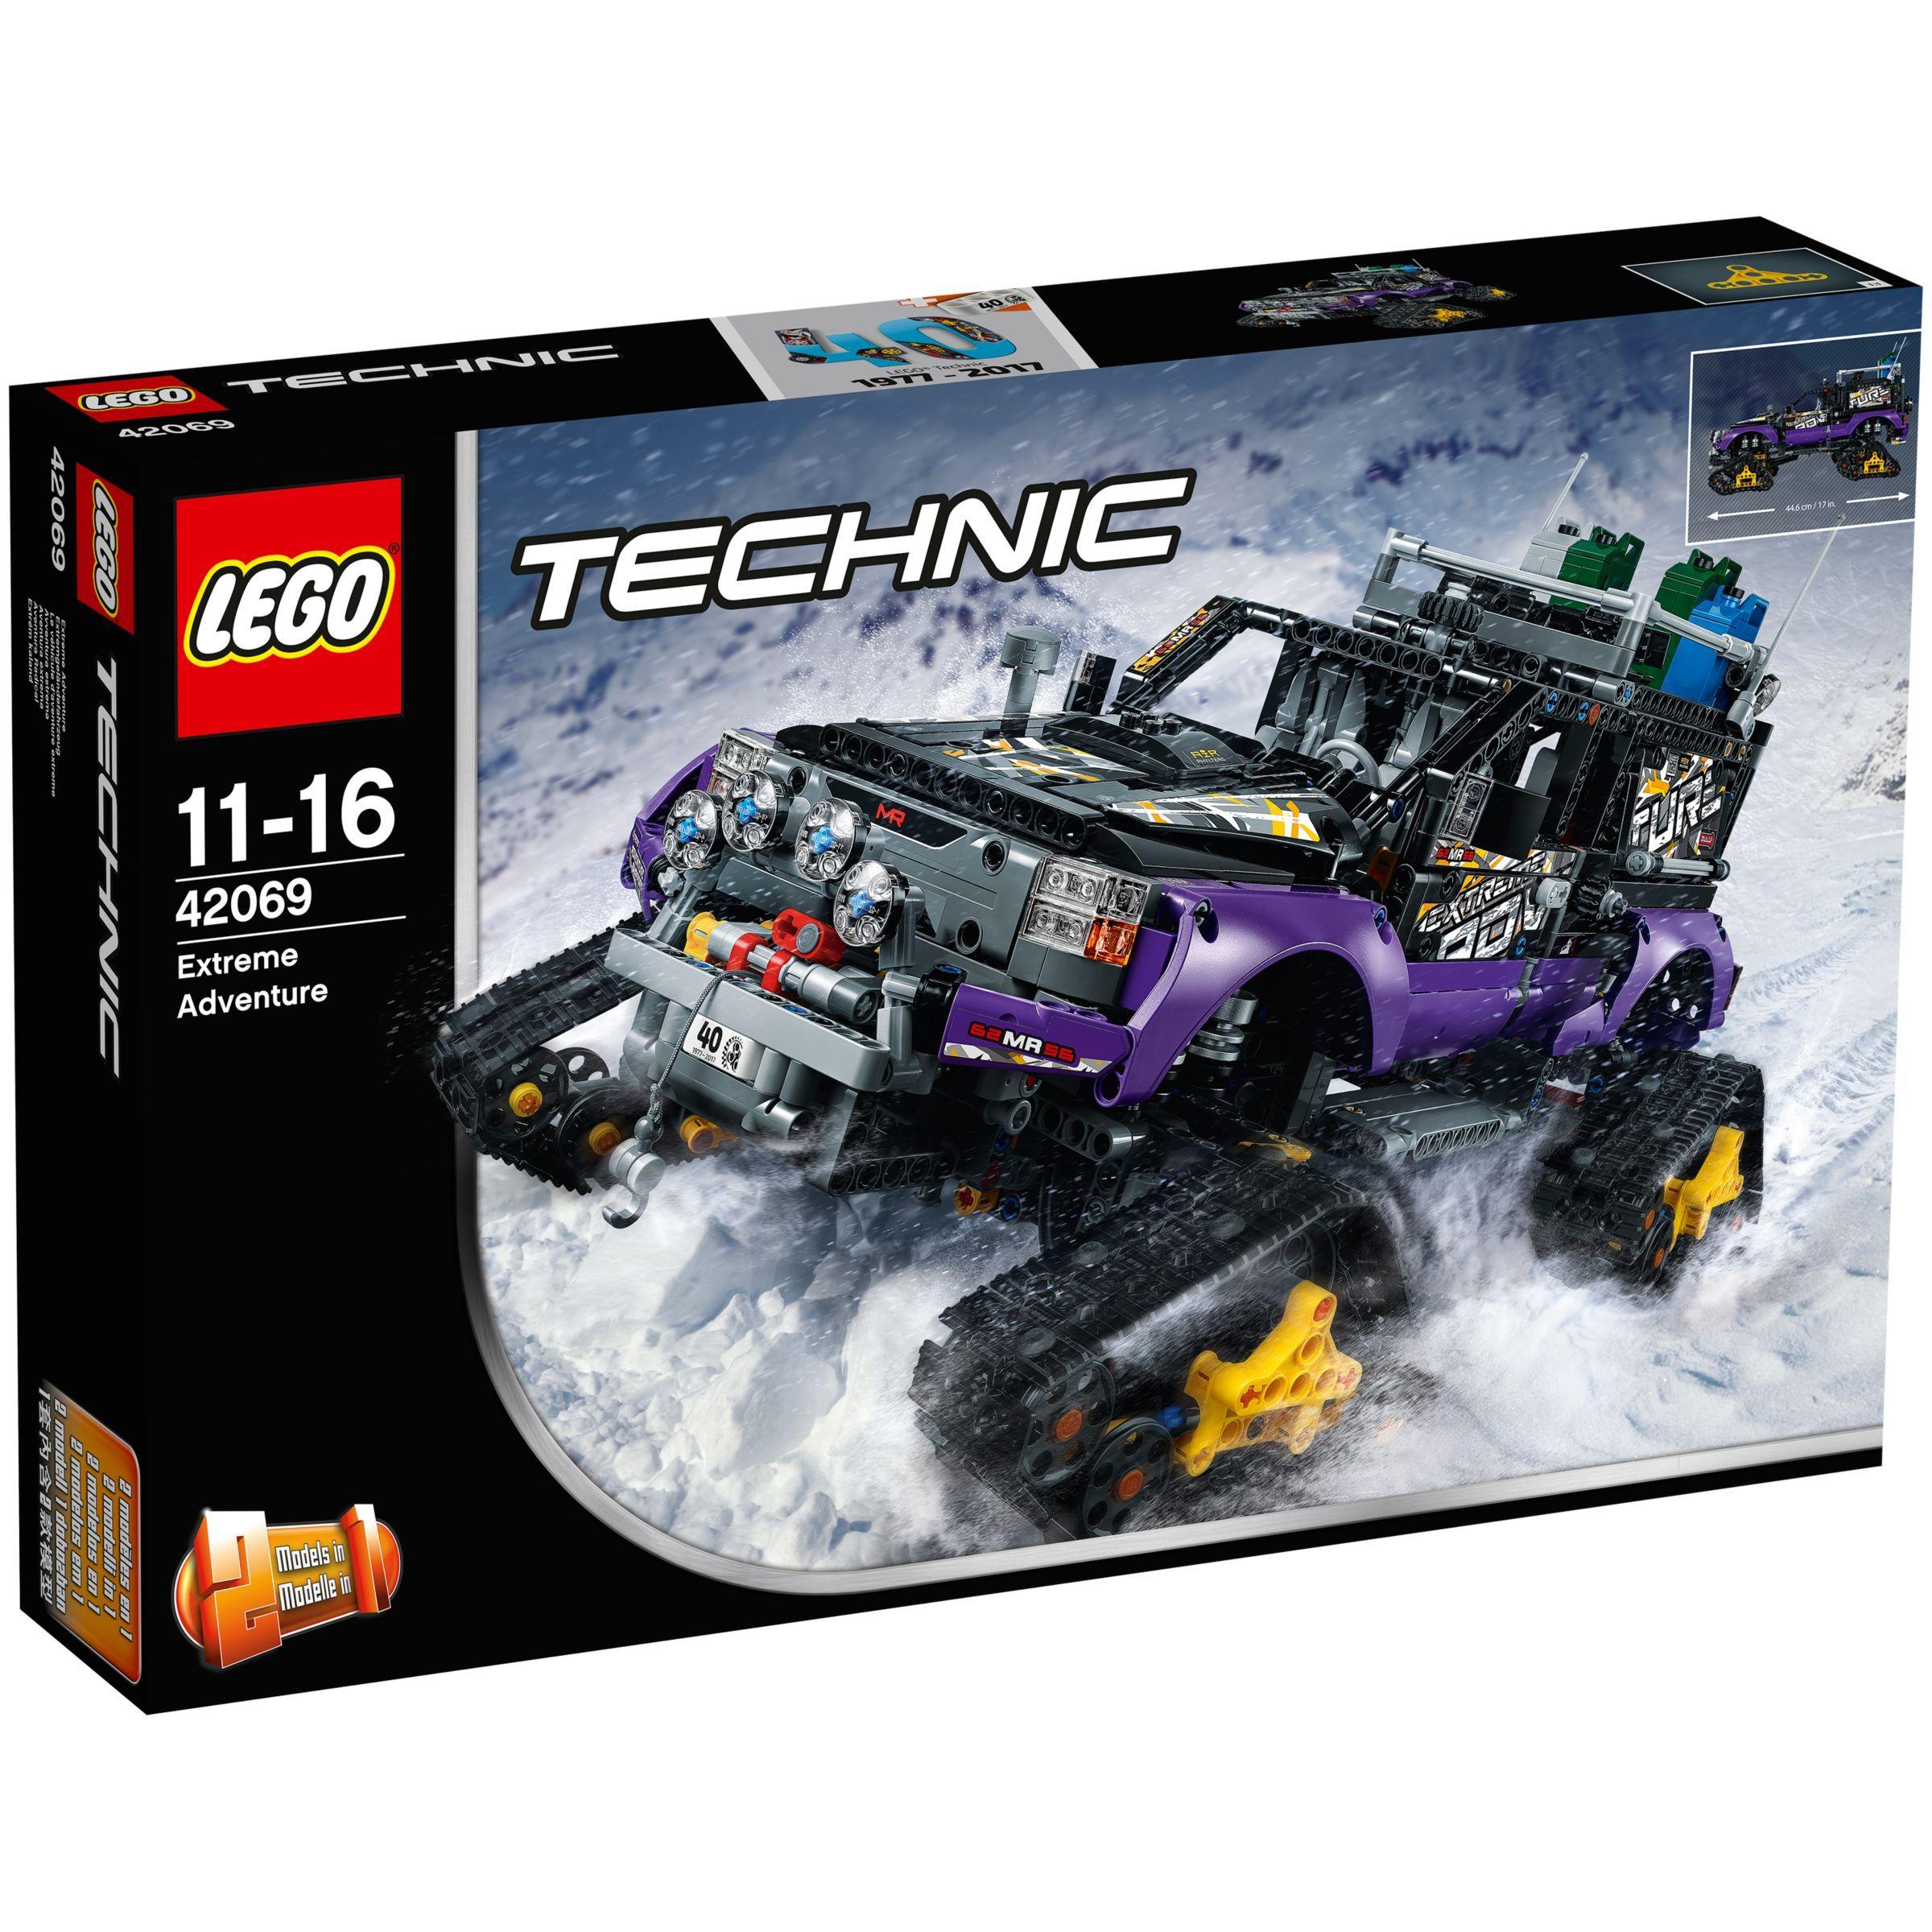 Lego Technic 42069 Extreme Adventure Lego Technic Lego